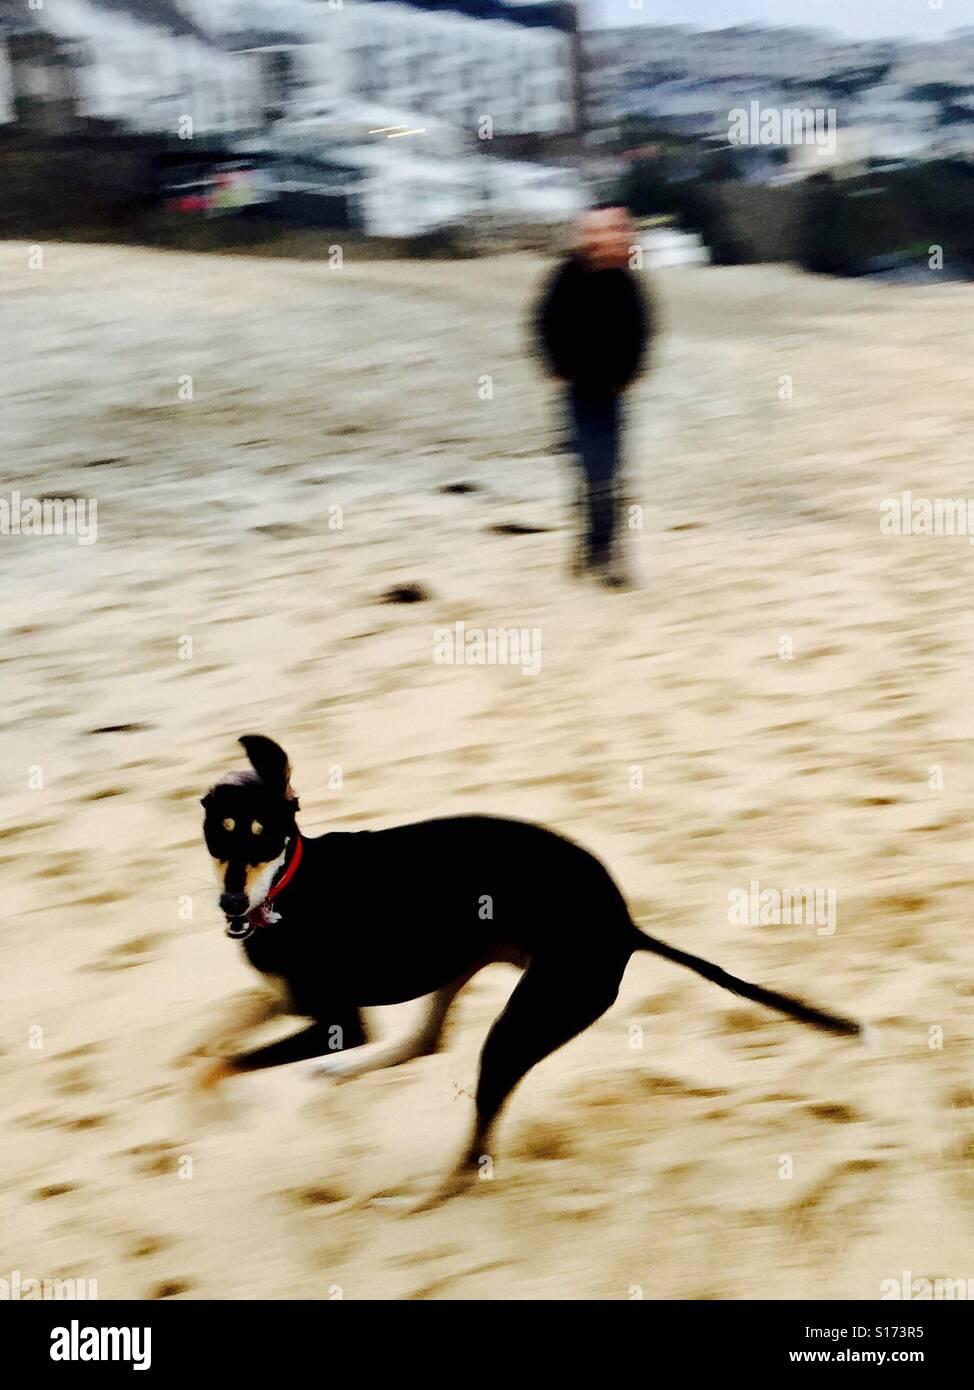 Happiness of beach dog walking. - Stock Image